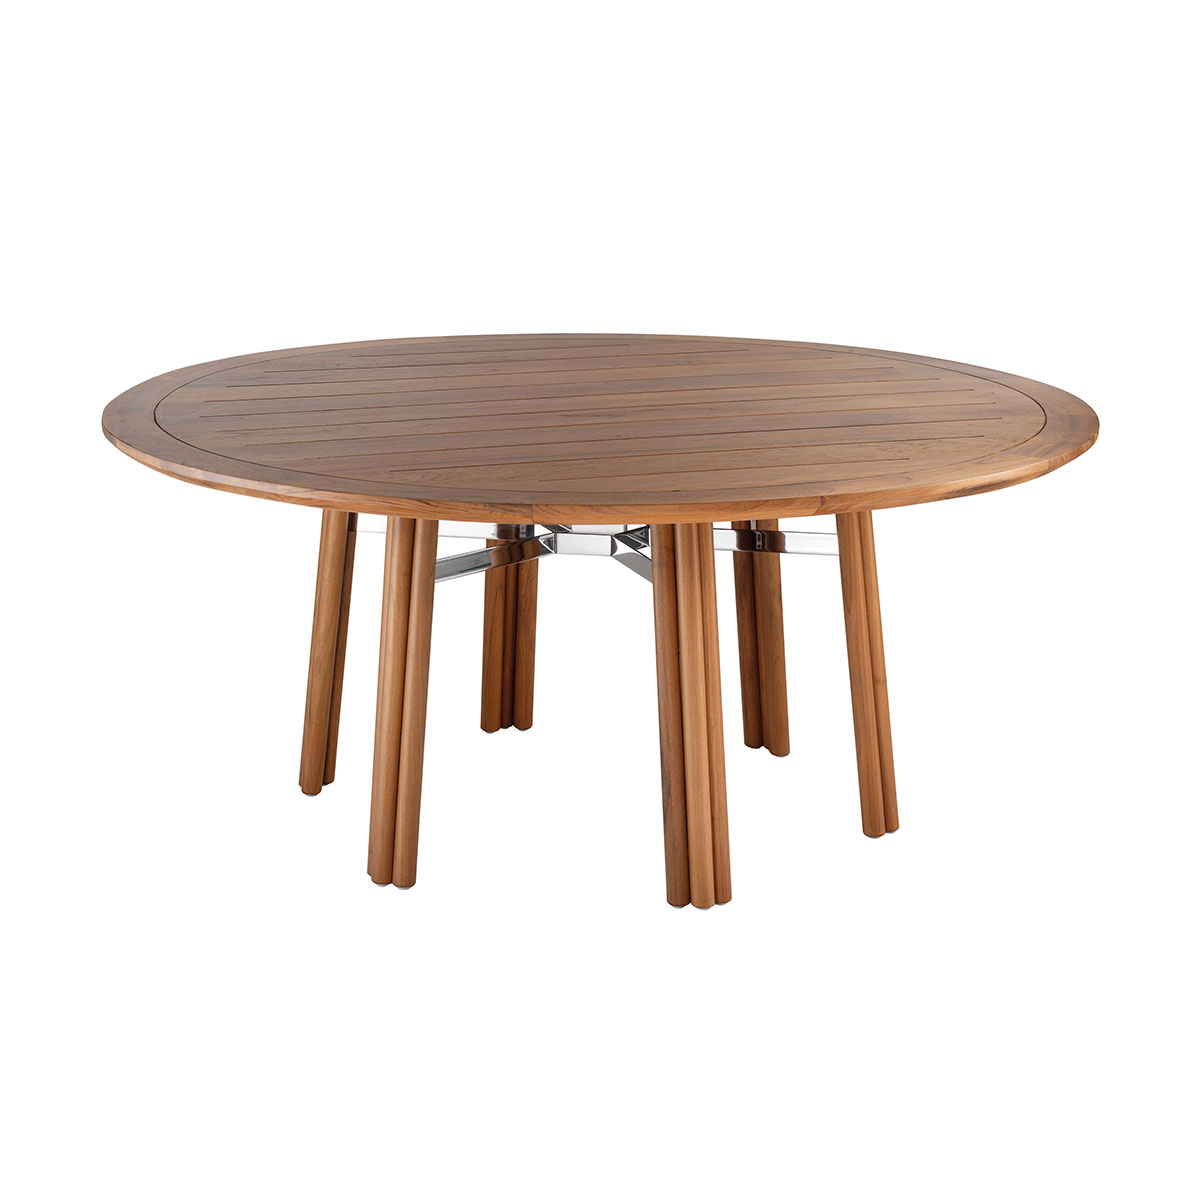 Round dining table Maxim Braid